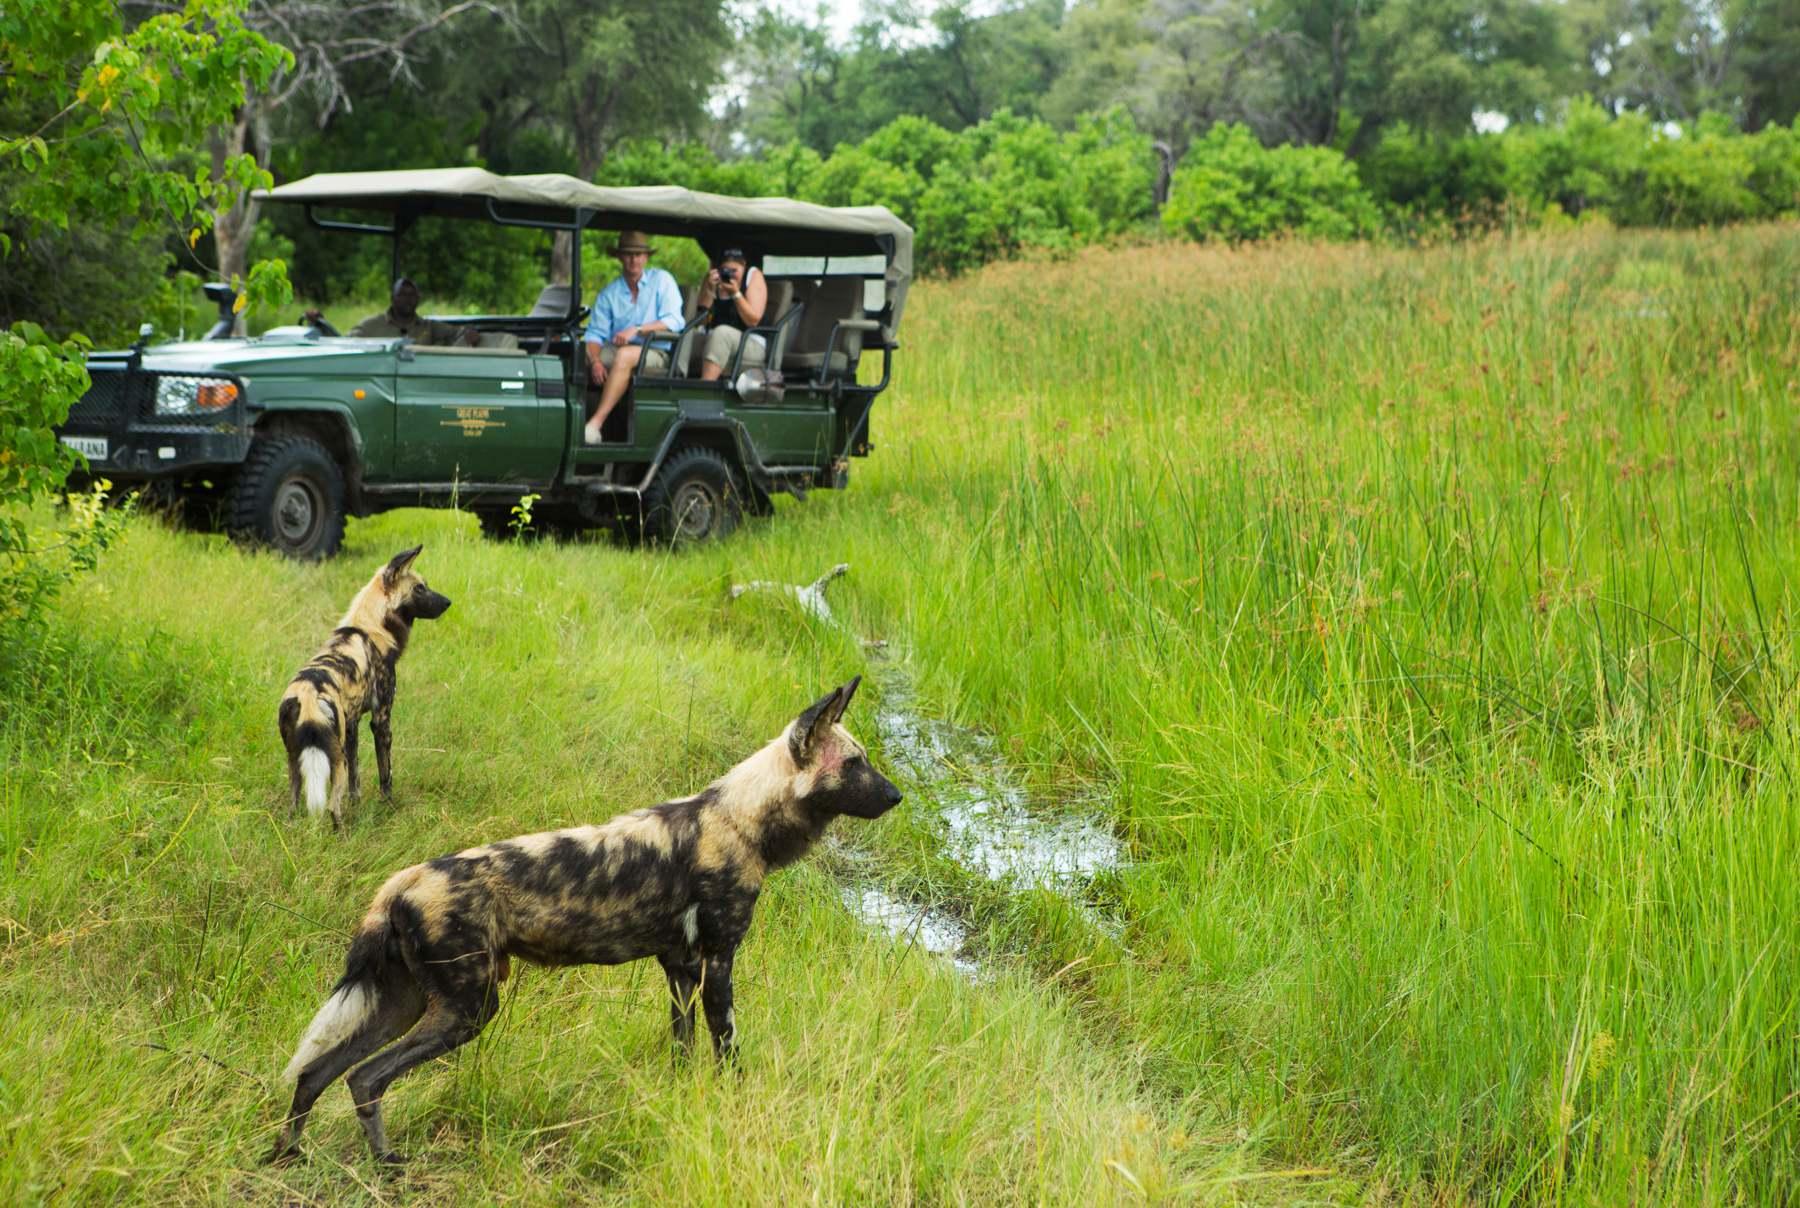 selindacamp-safari-experience-greatplainsconservation-2.jpg